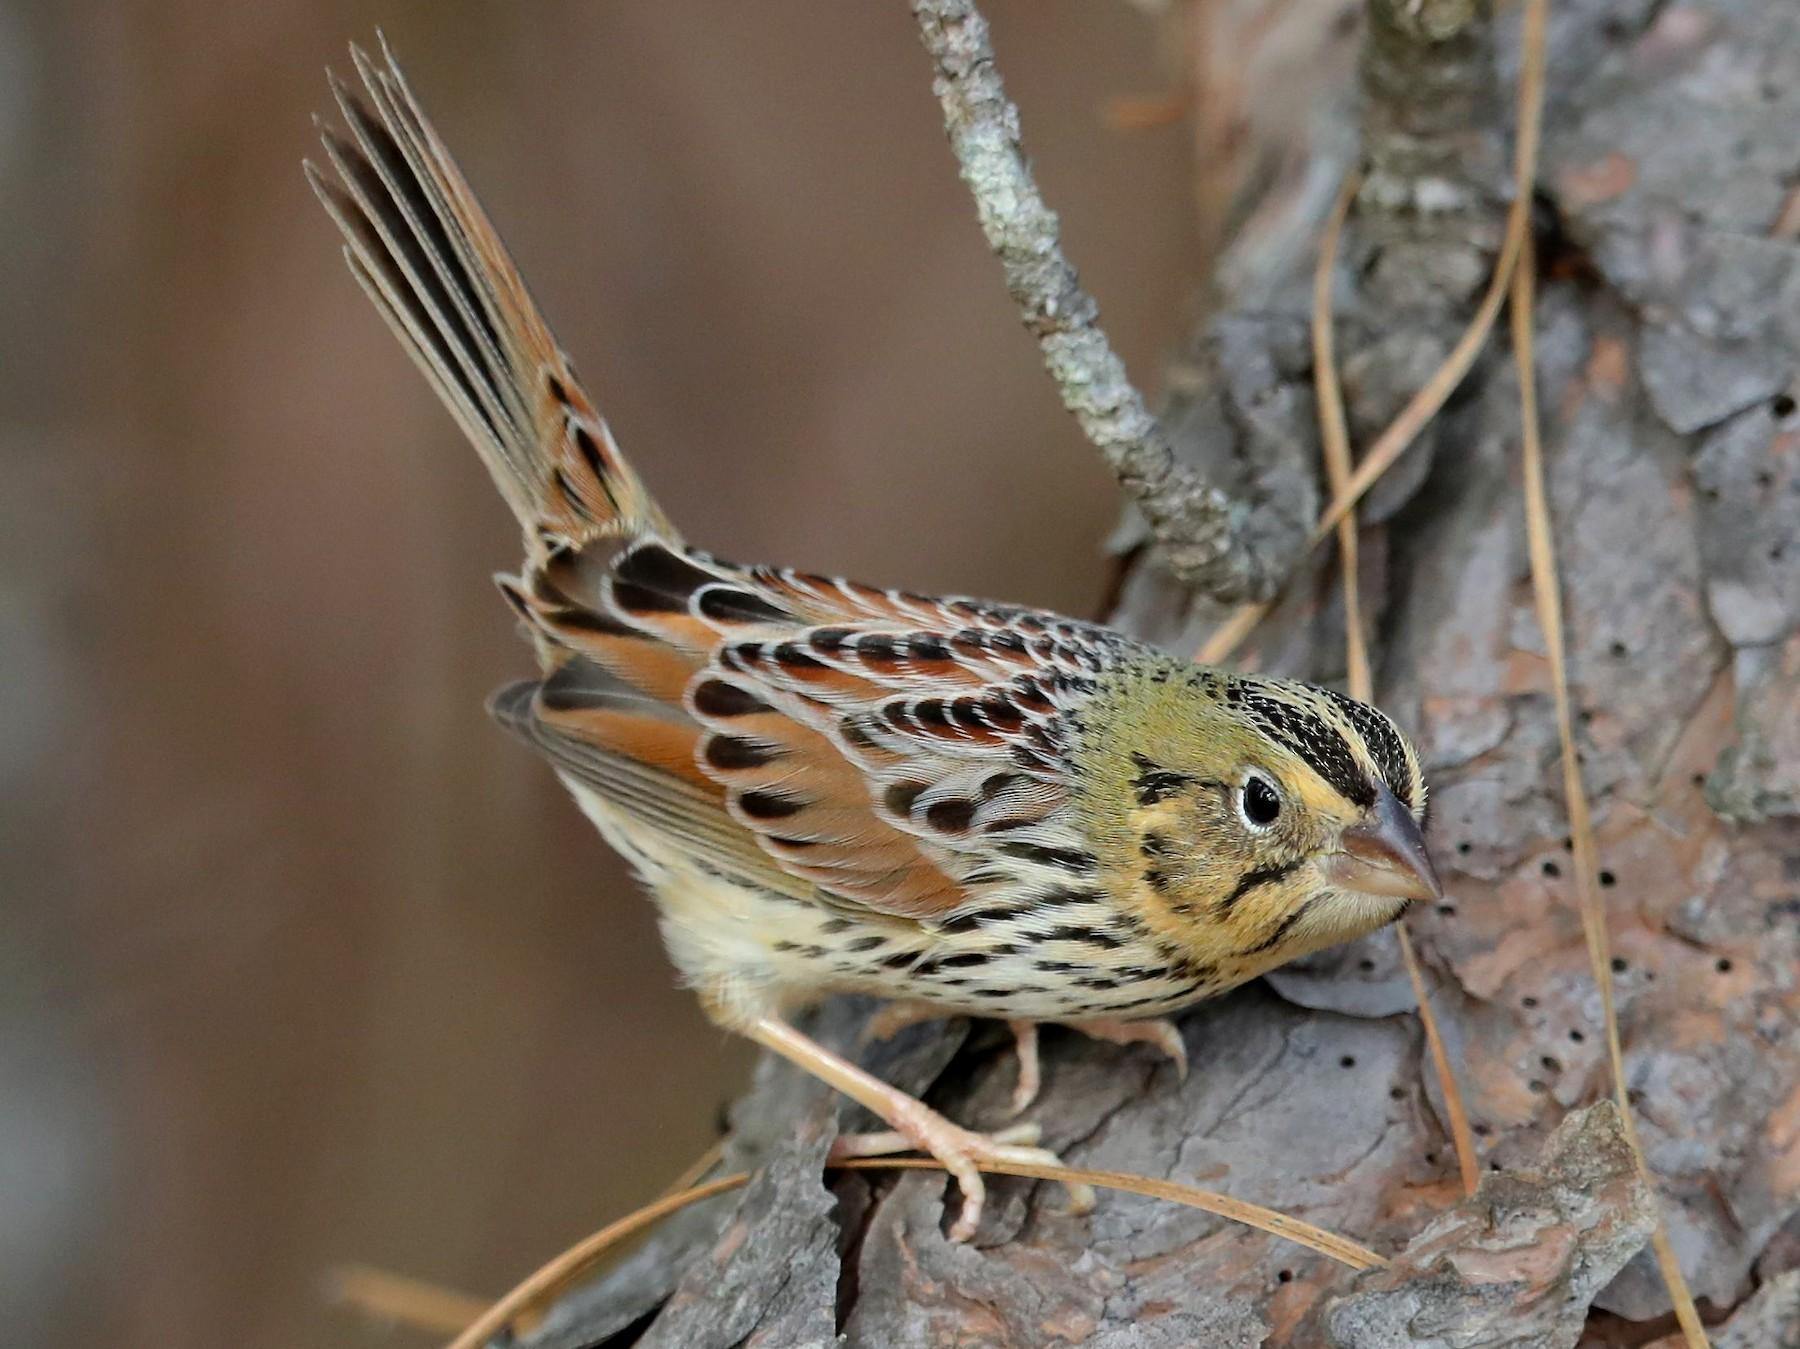 Henslow's Sparrow - Charles Lyon